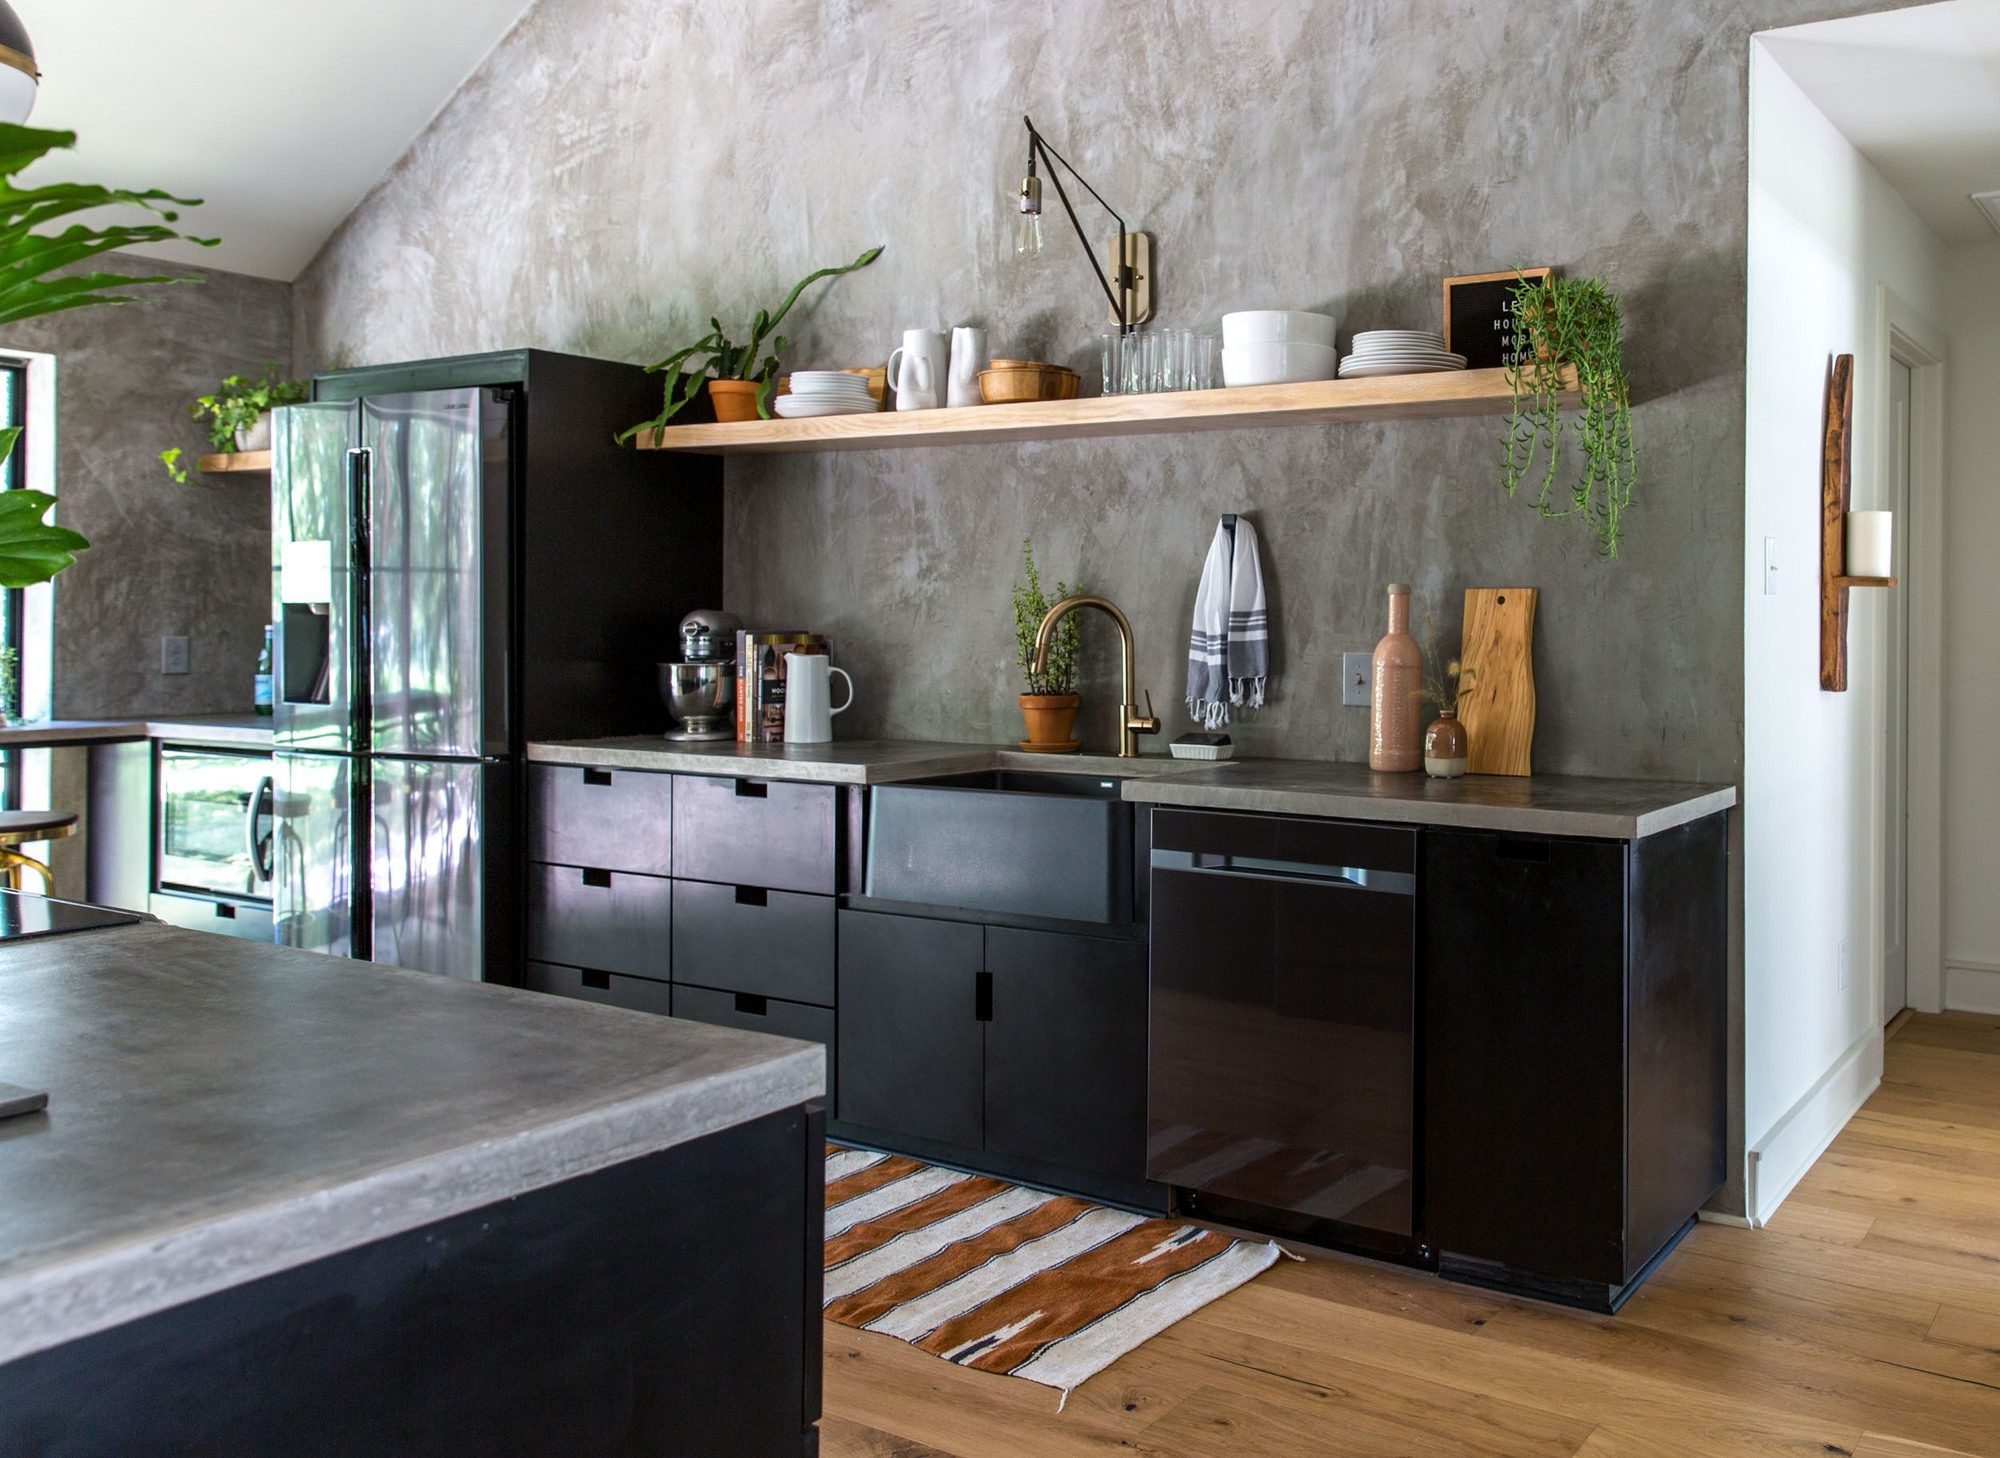 Episode 06 The Pick A Door House Magnolia Fixer Upper Kitchen Kitchen Renovation Kitchen Remodel